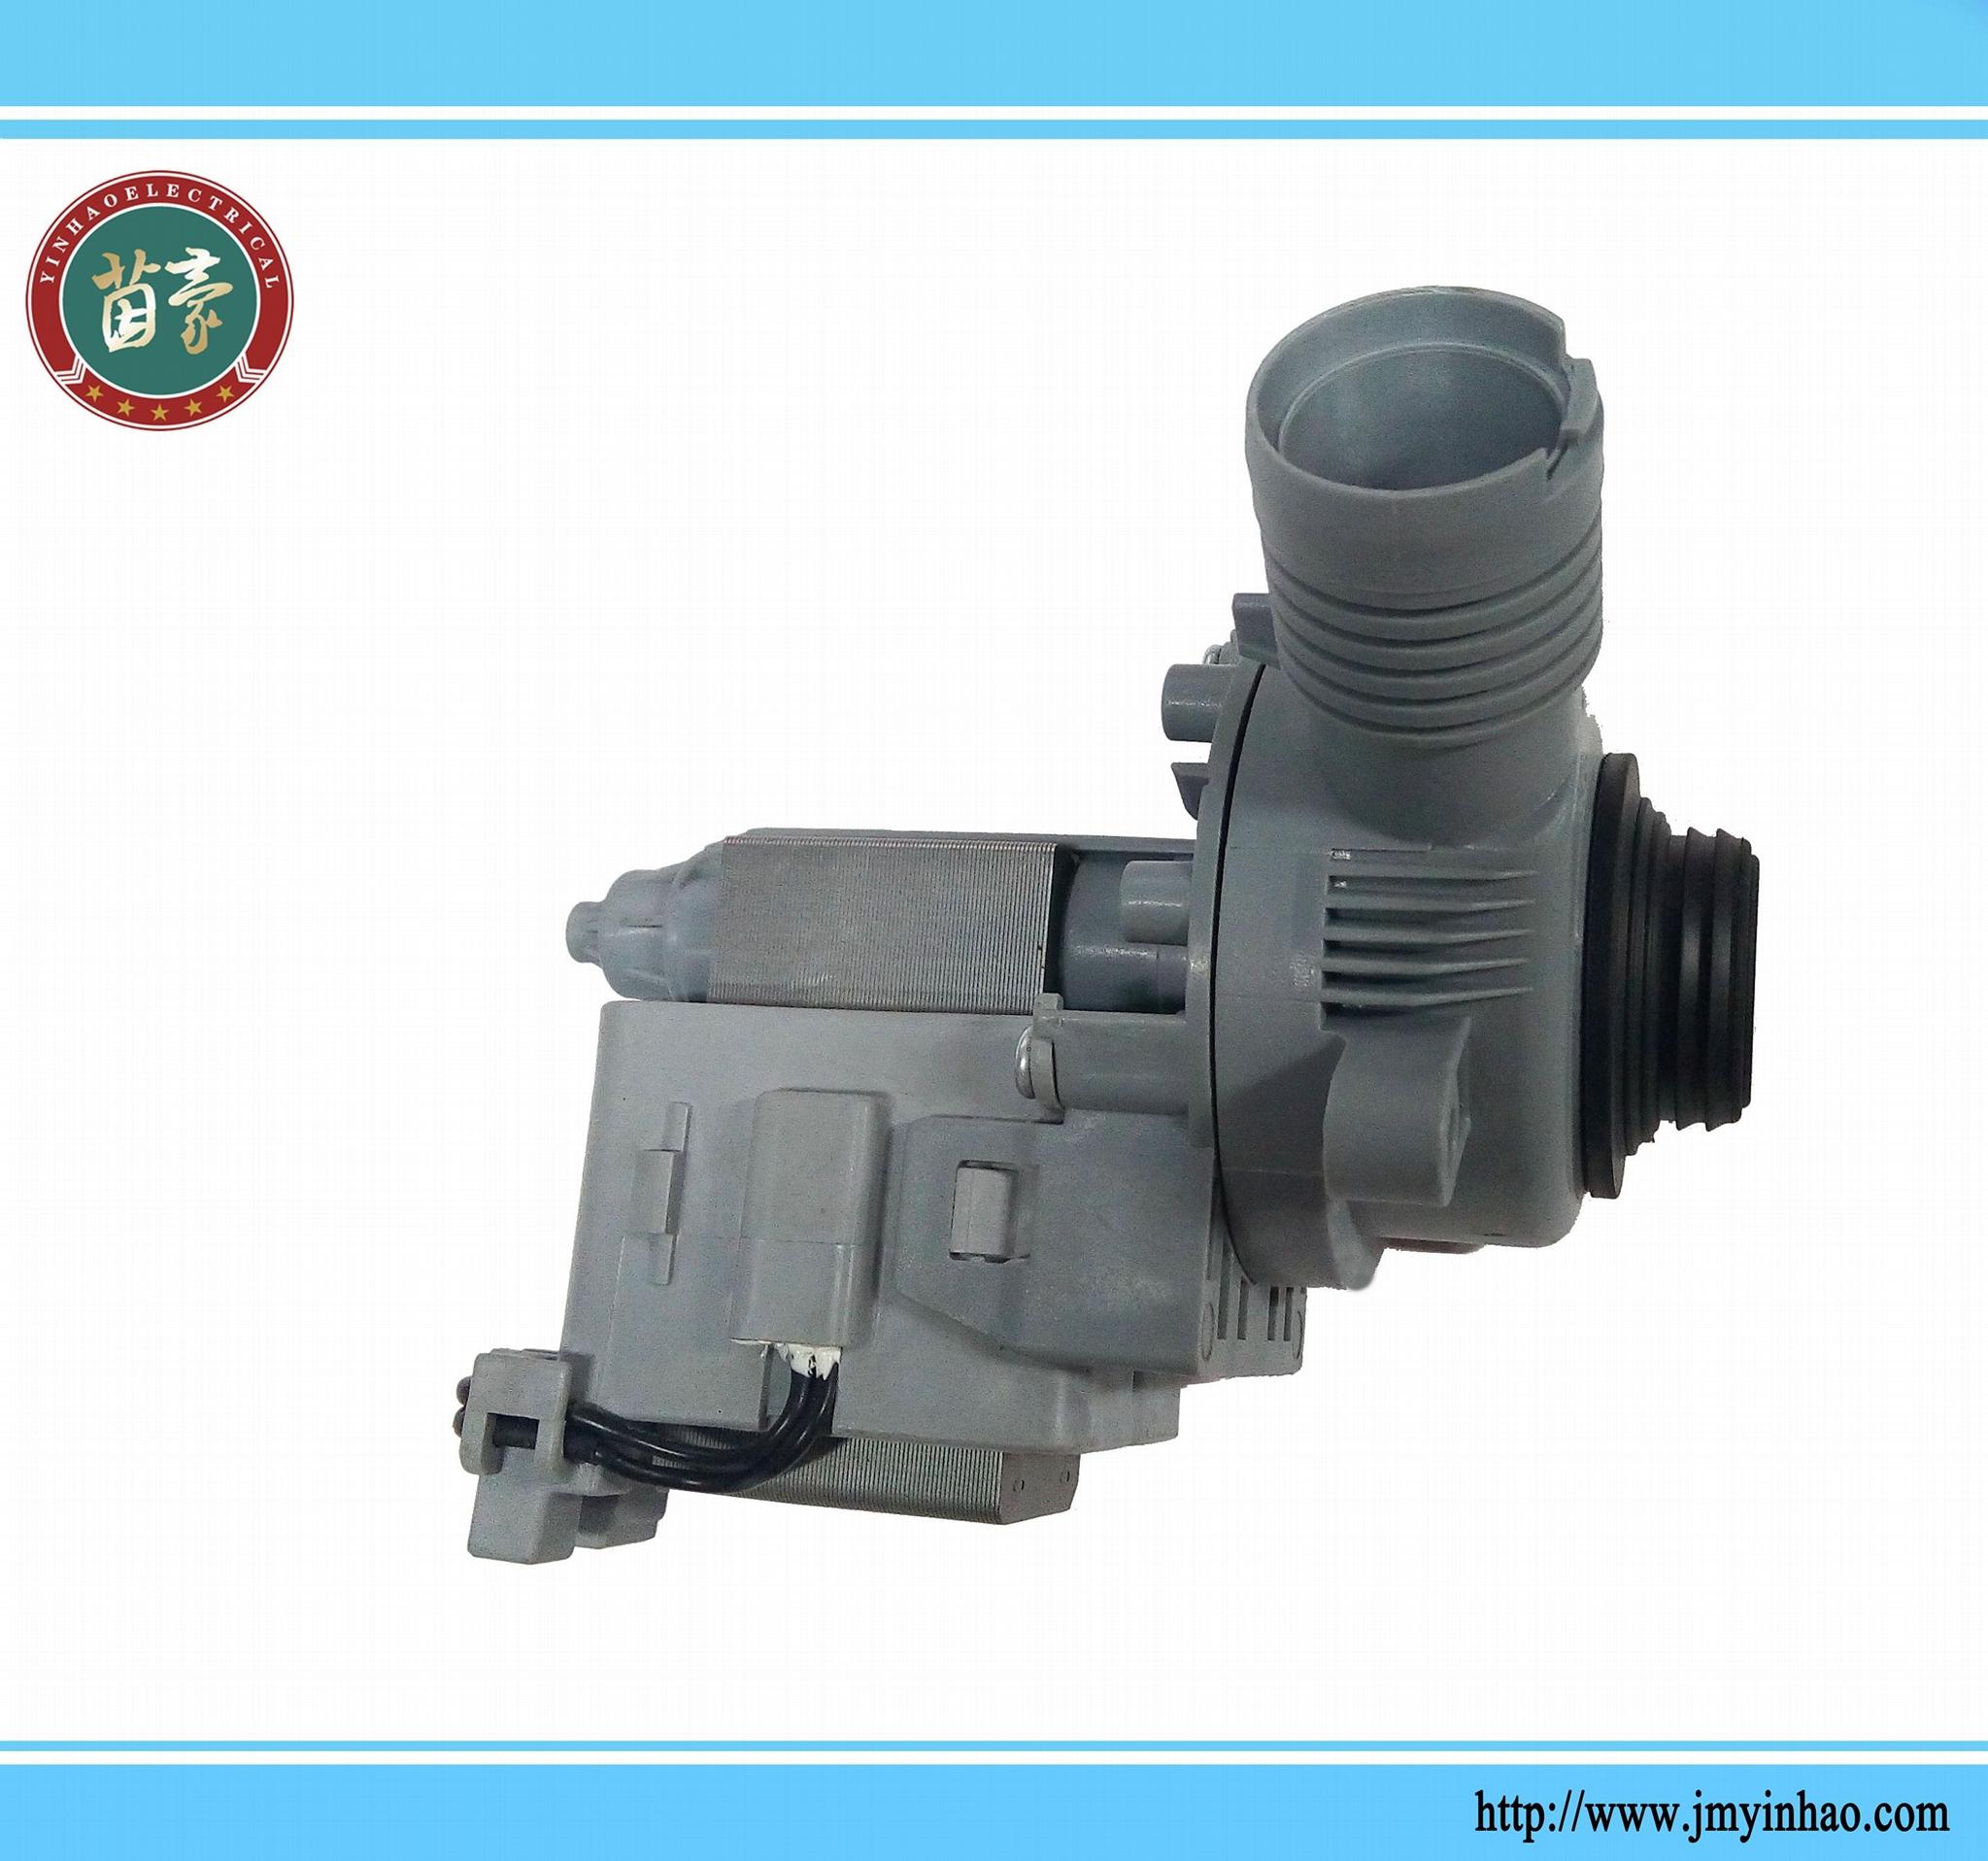 W10276397-Washing Machine Drain Pump for Whirlpool NEW OEM 2